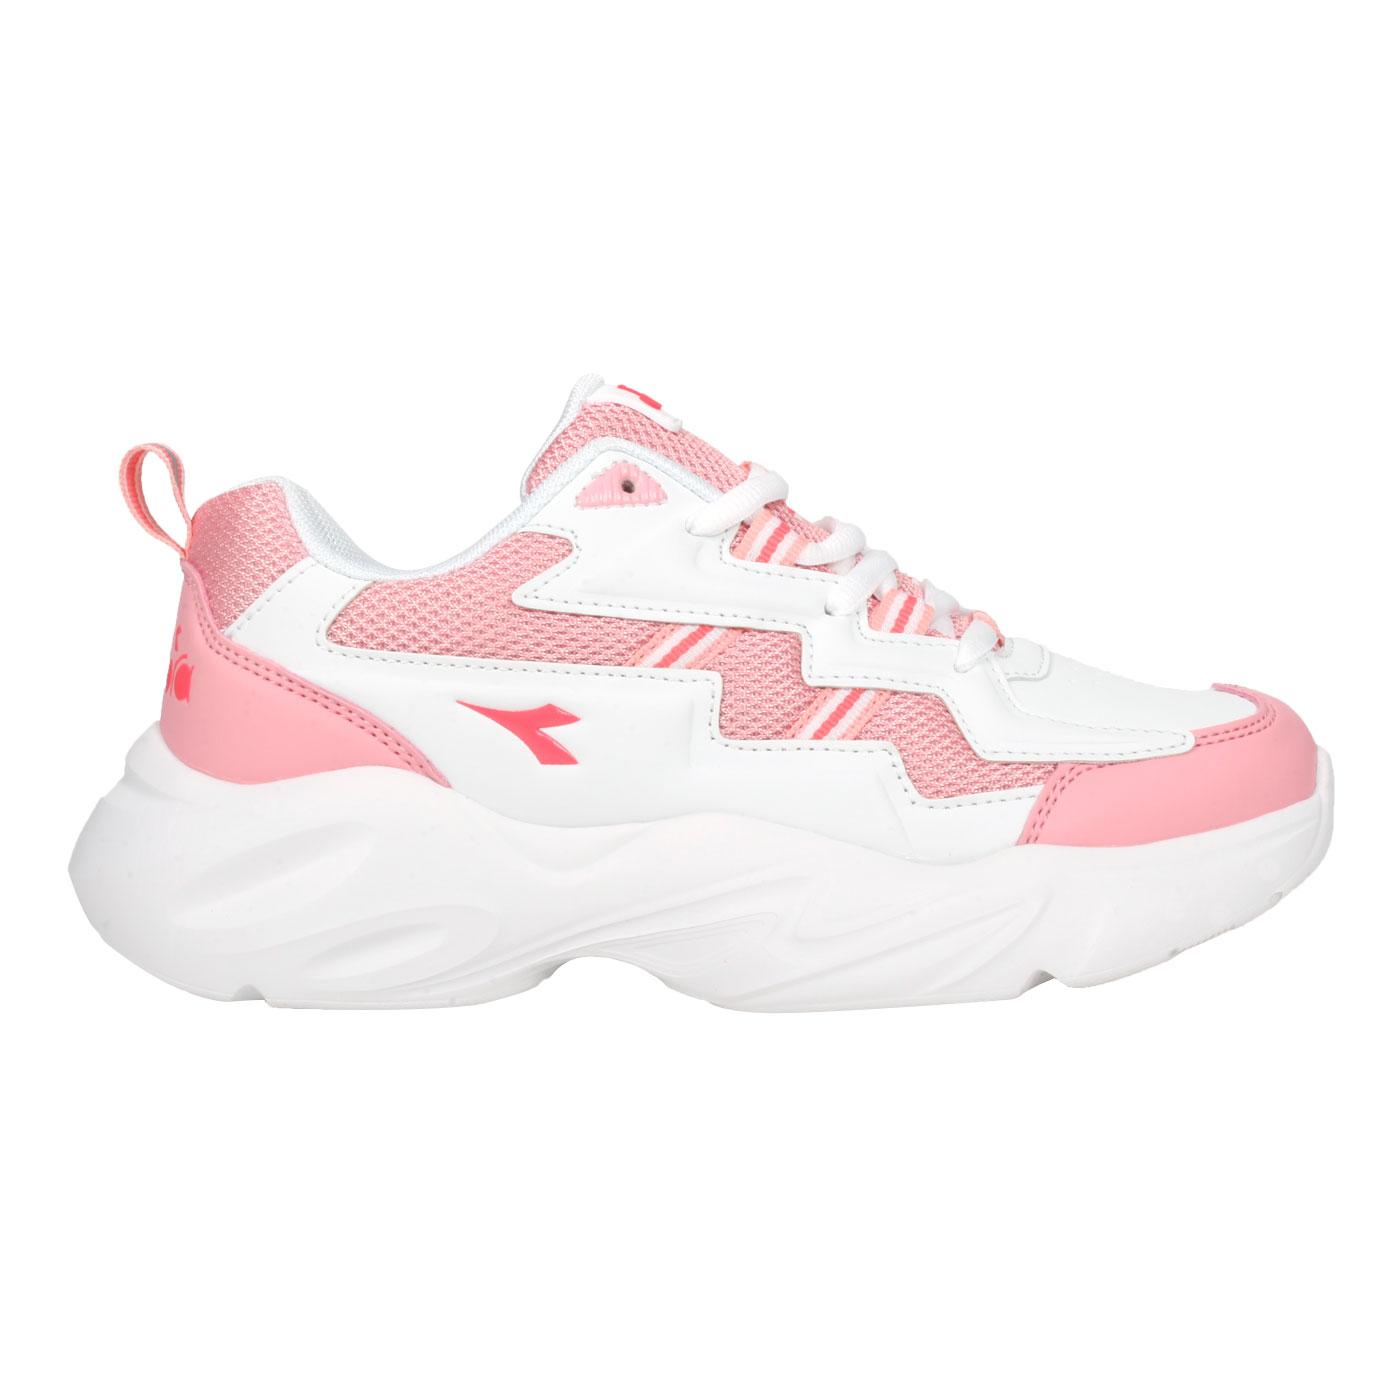 DIADORA 女款休閒運動鞋 DA31656